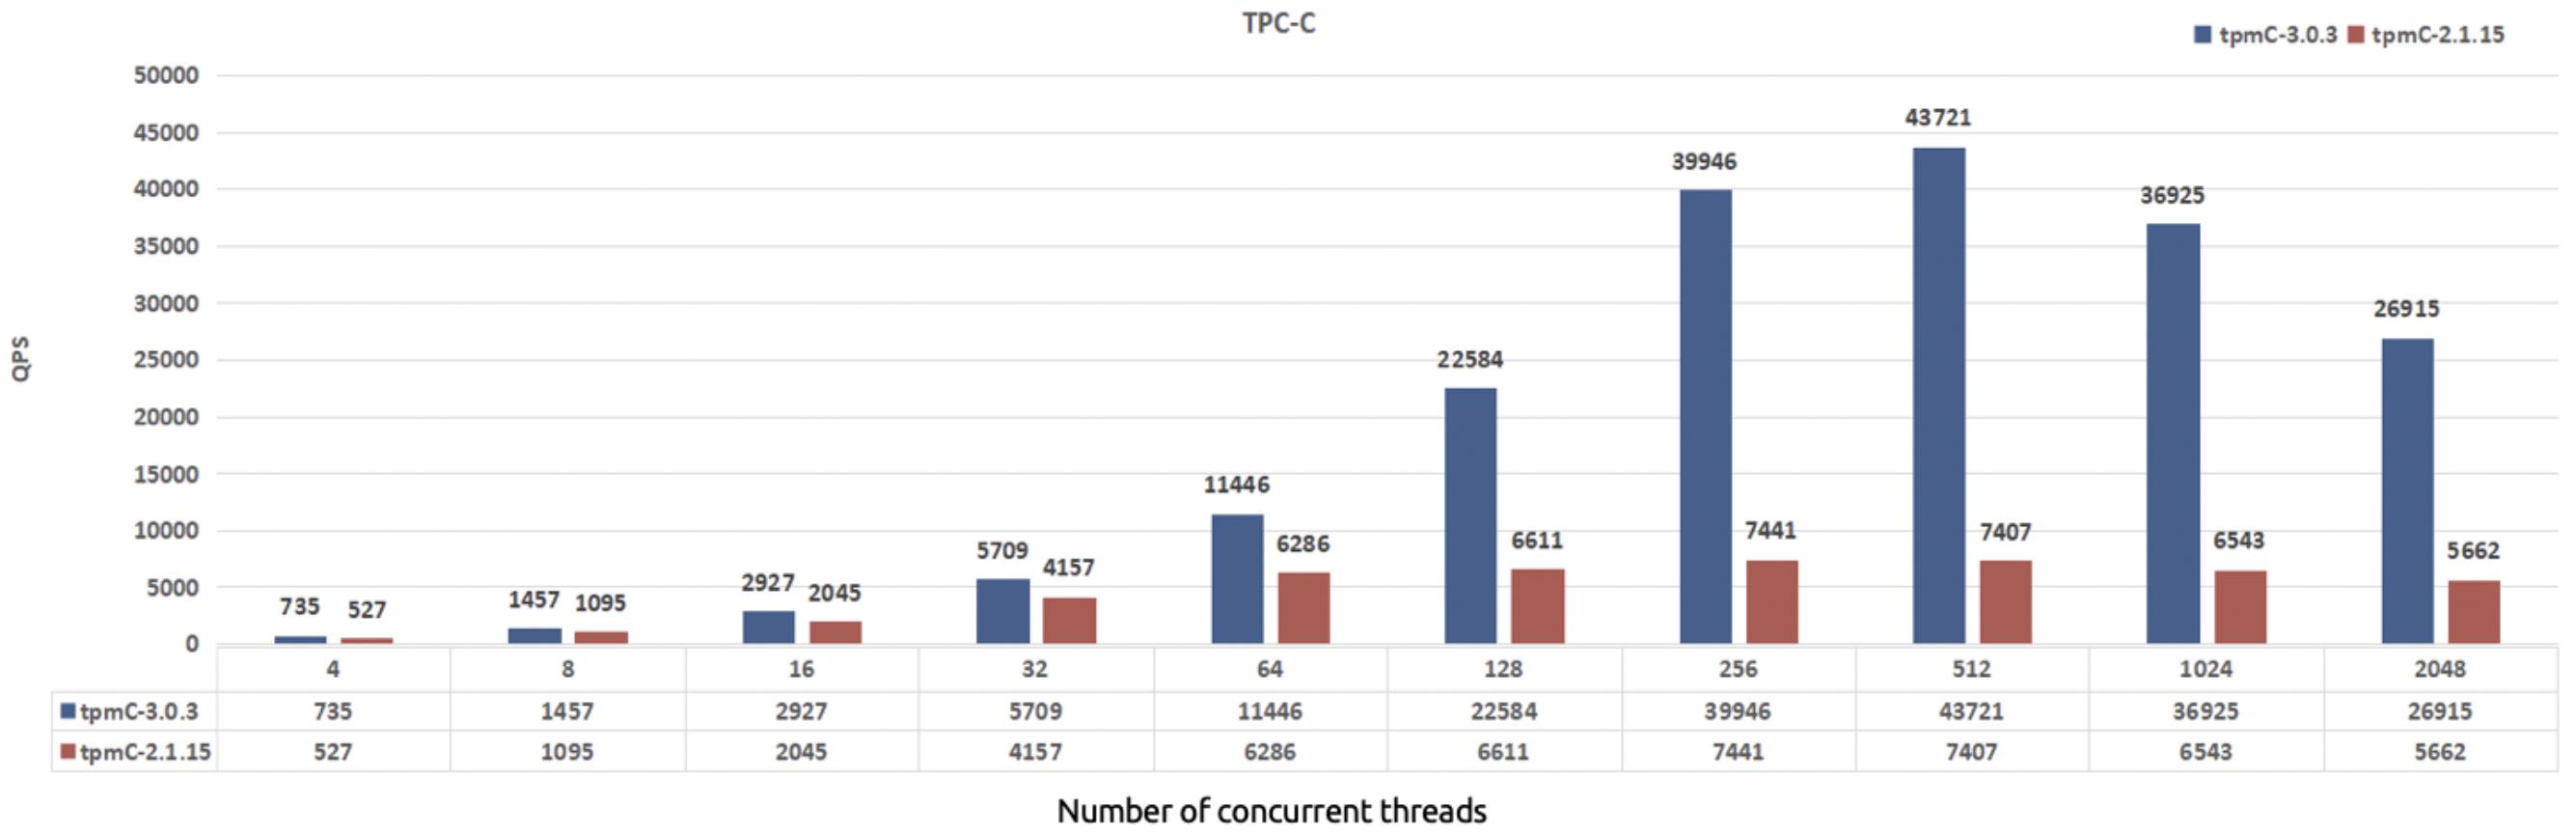 TPC-C performance comparison